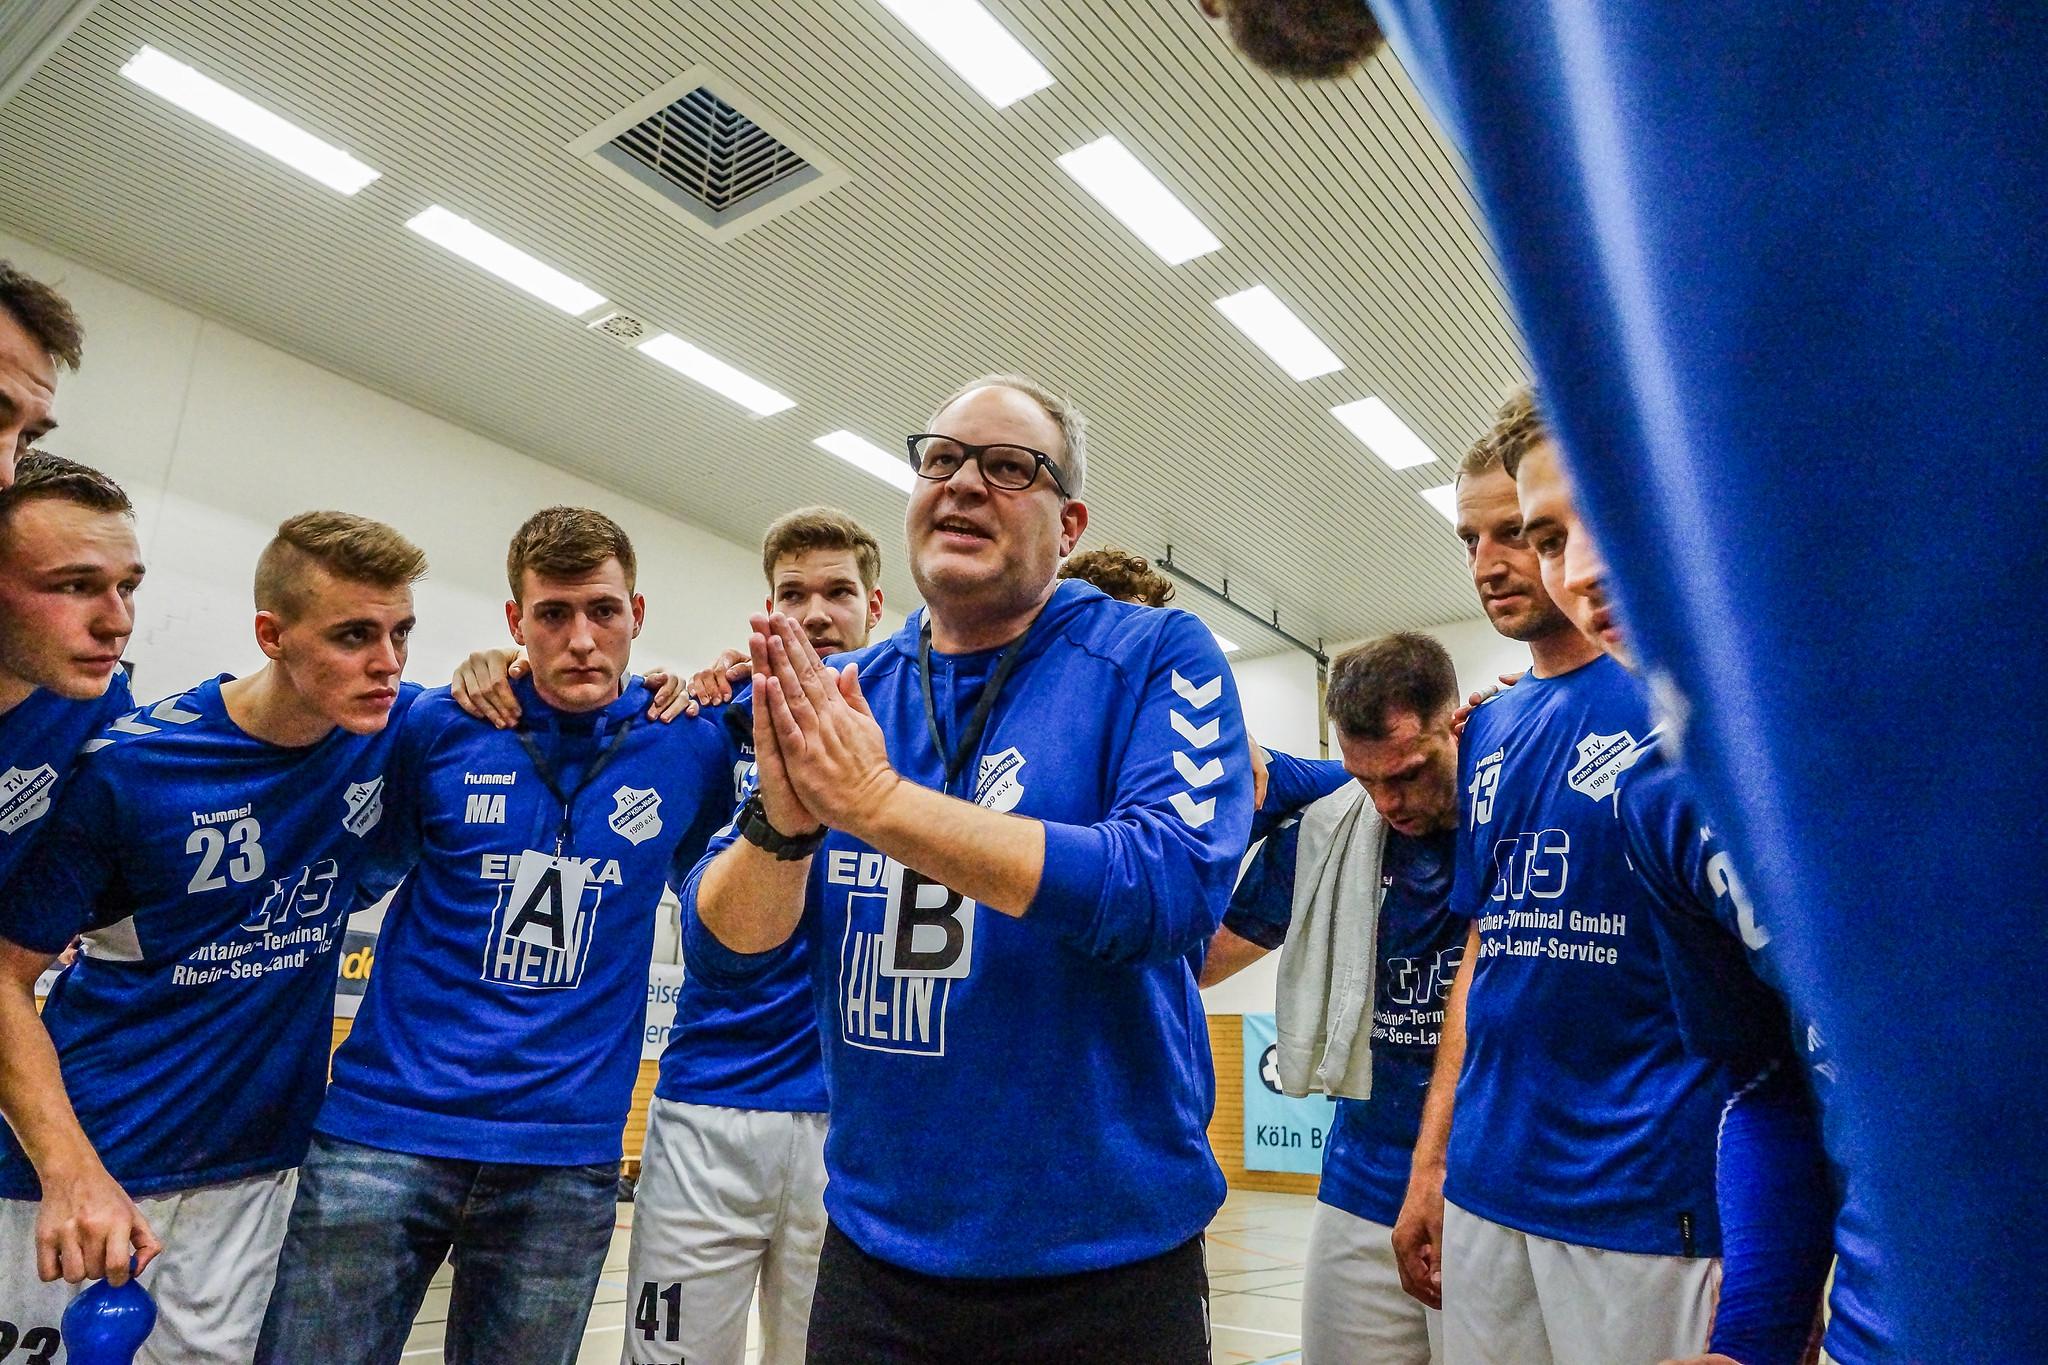 2. Herren: Markus Pähler muss Traineramt niederlegen